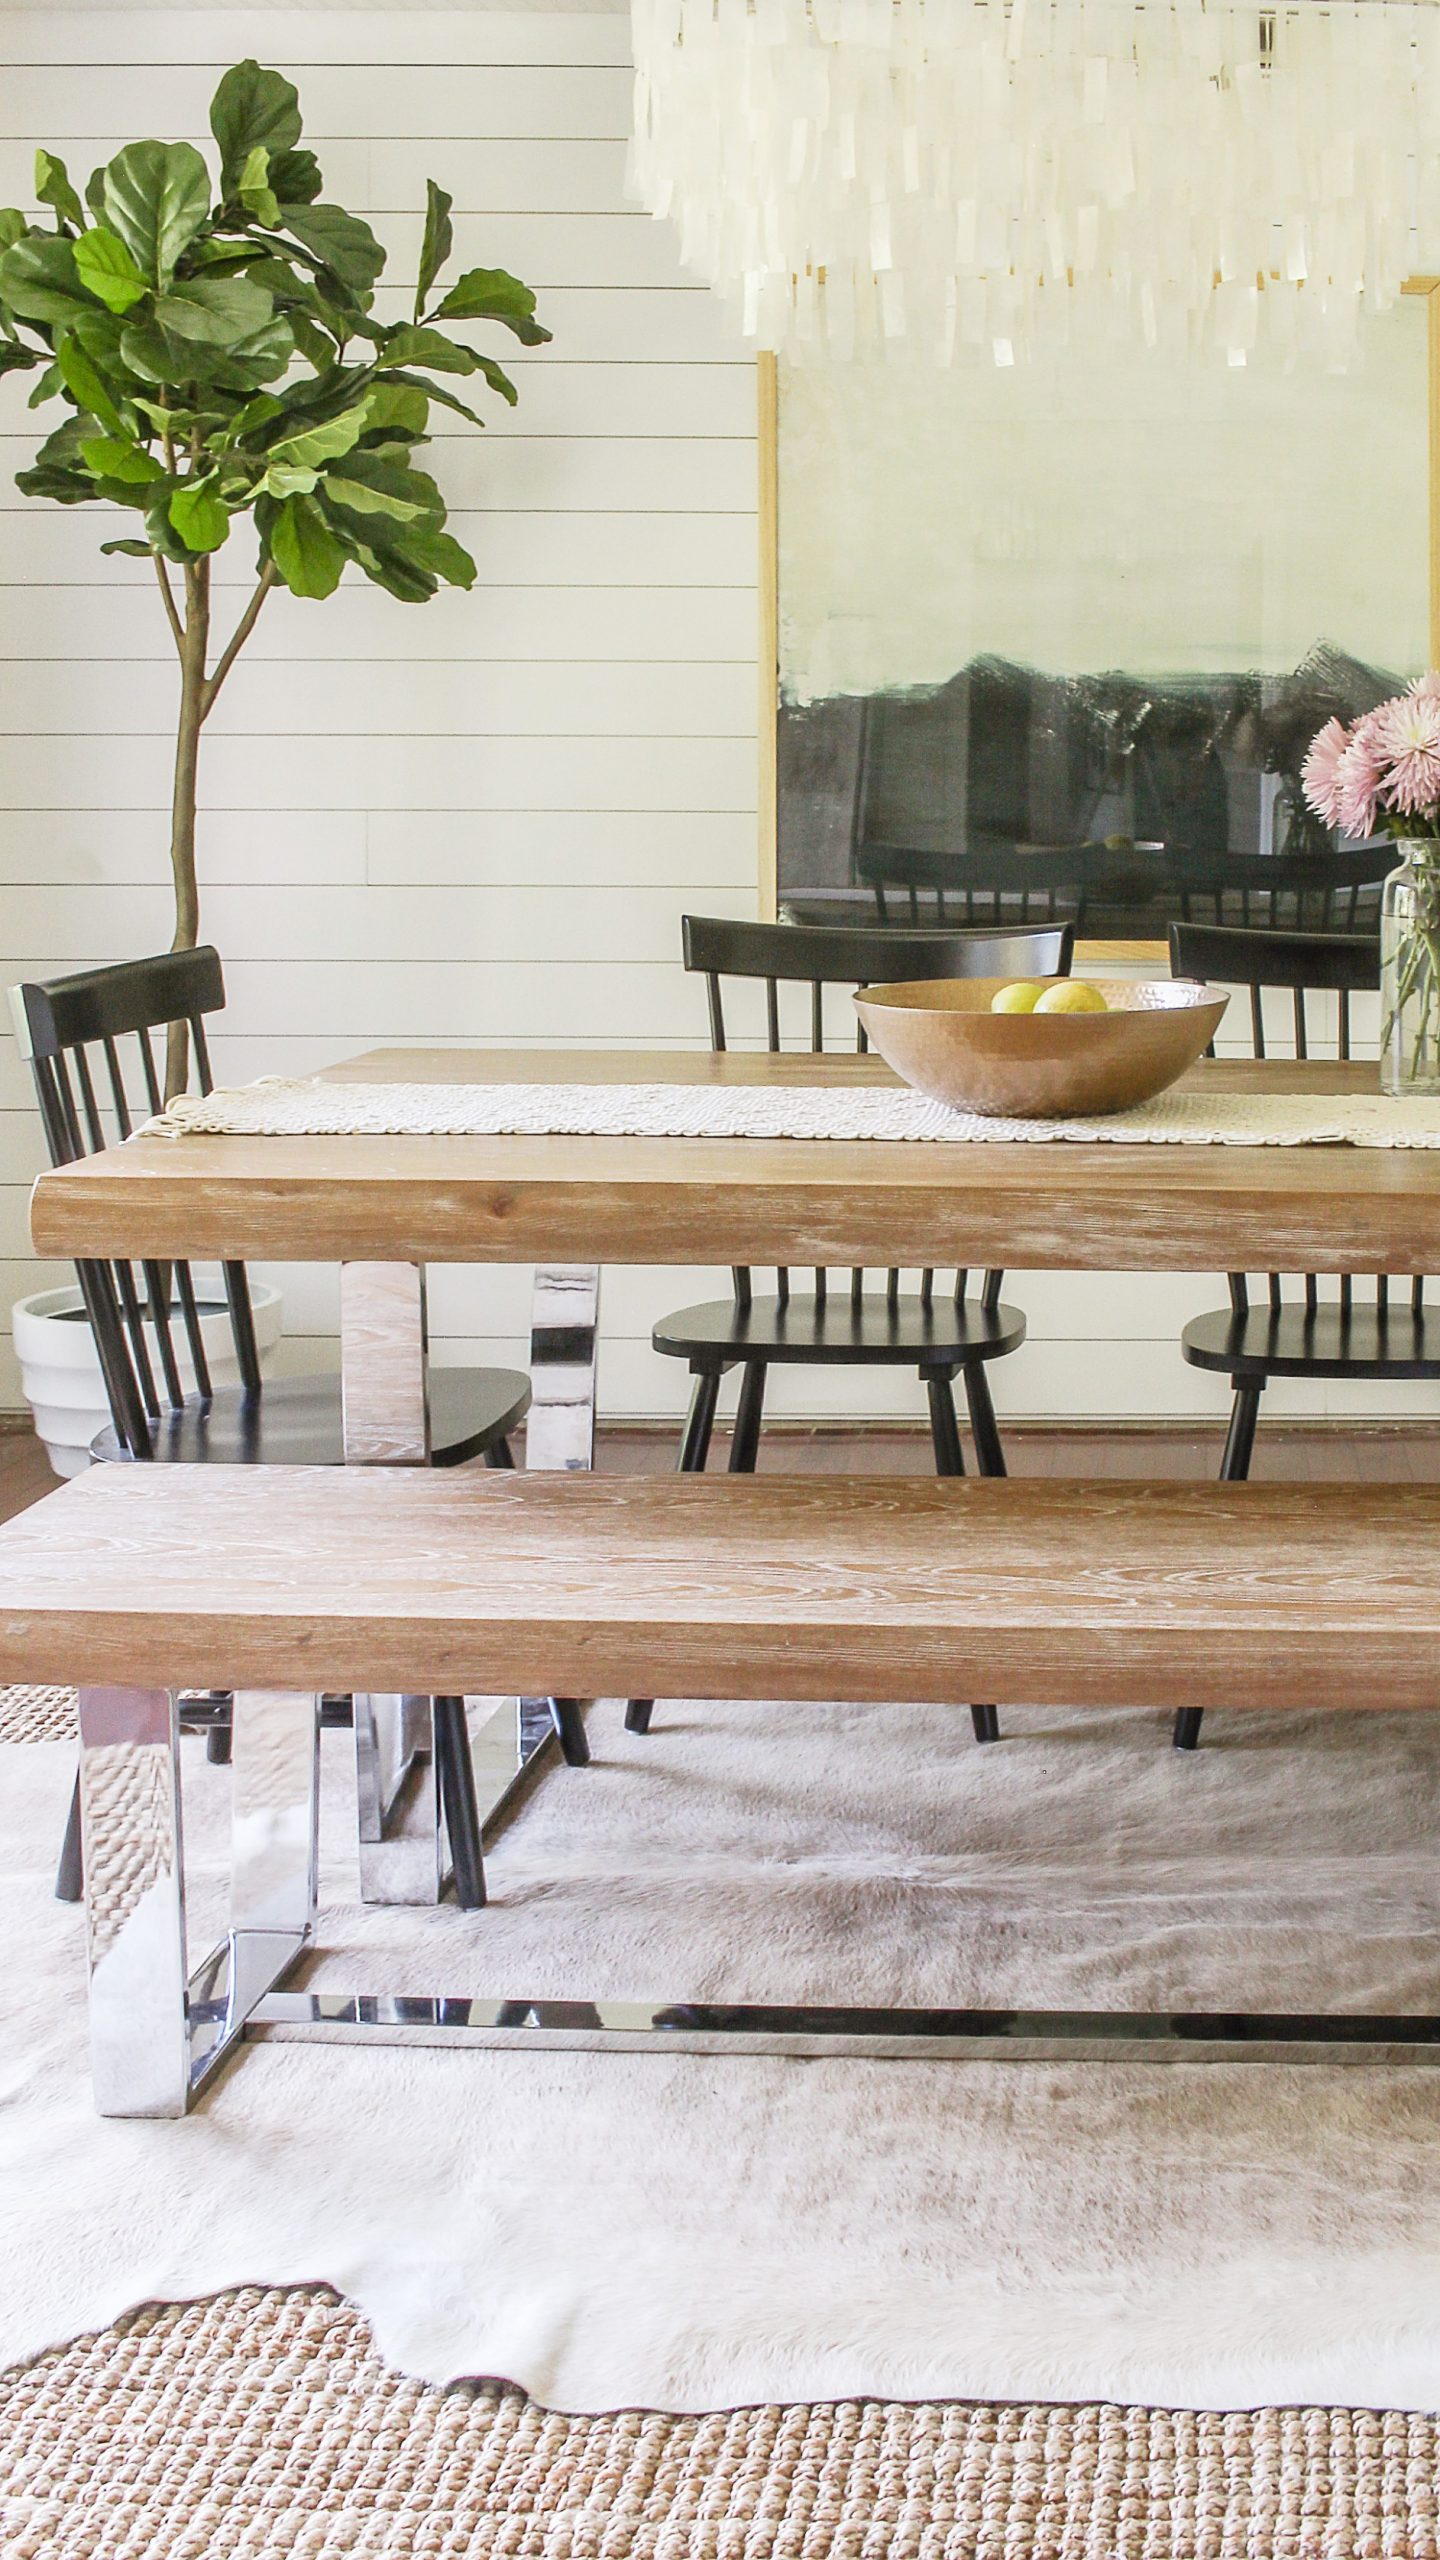 Modern Farmhouse Dining Room Reveal- Interior Design Ideas on a Budget - Dining Room Ideas Modern Farmhouse